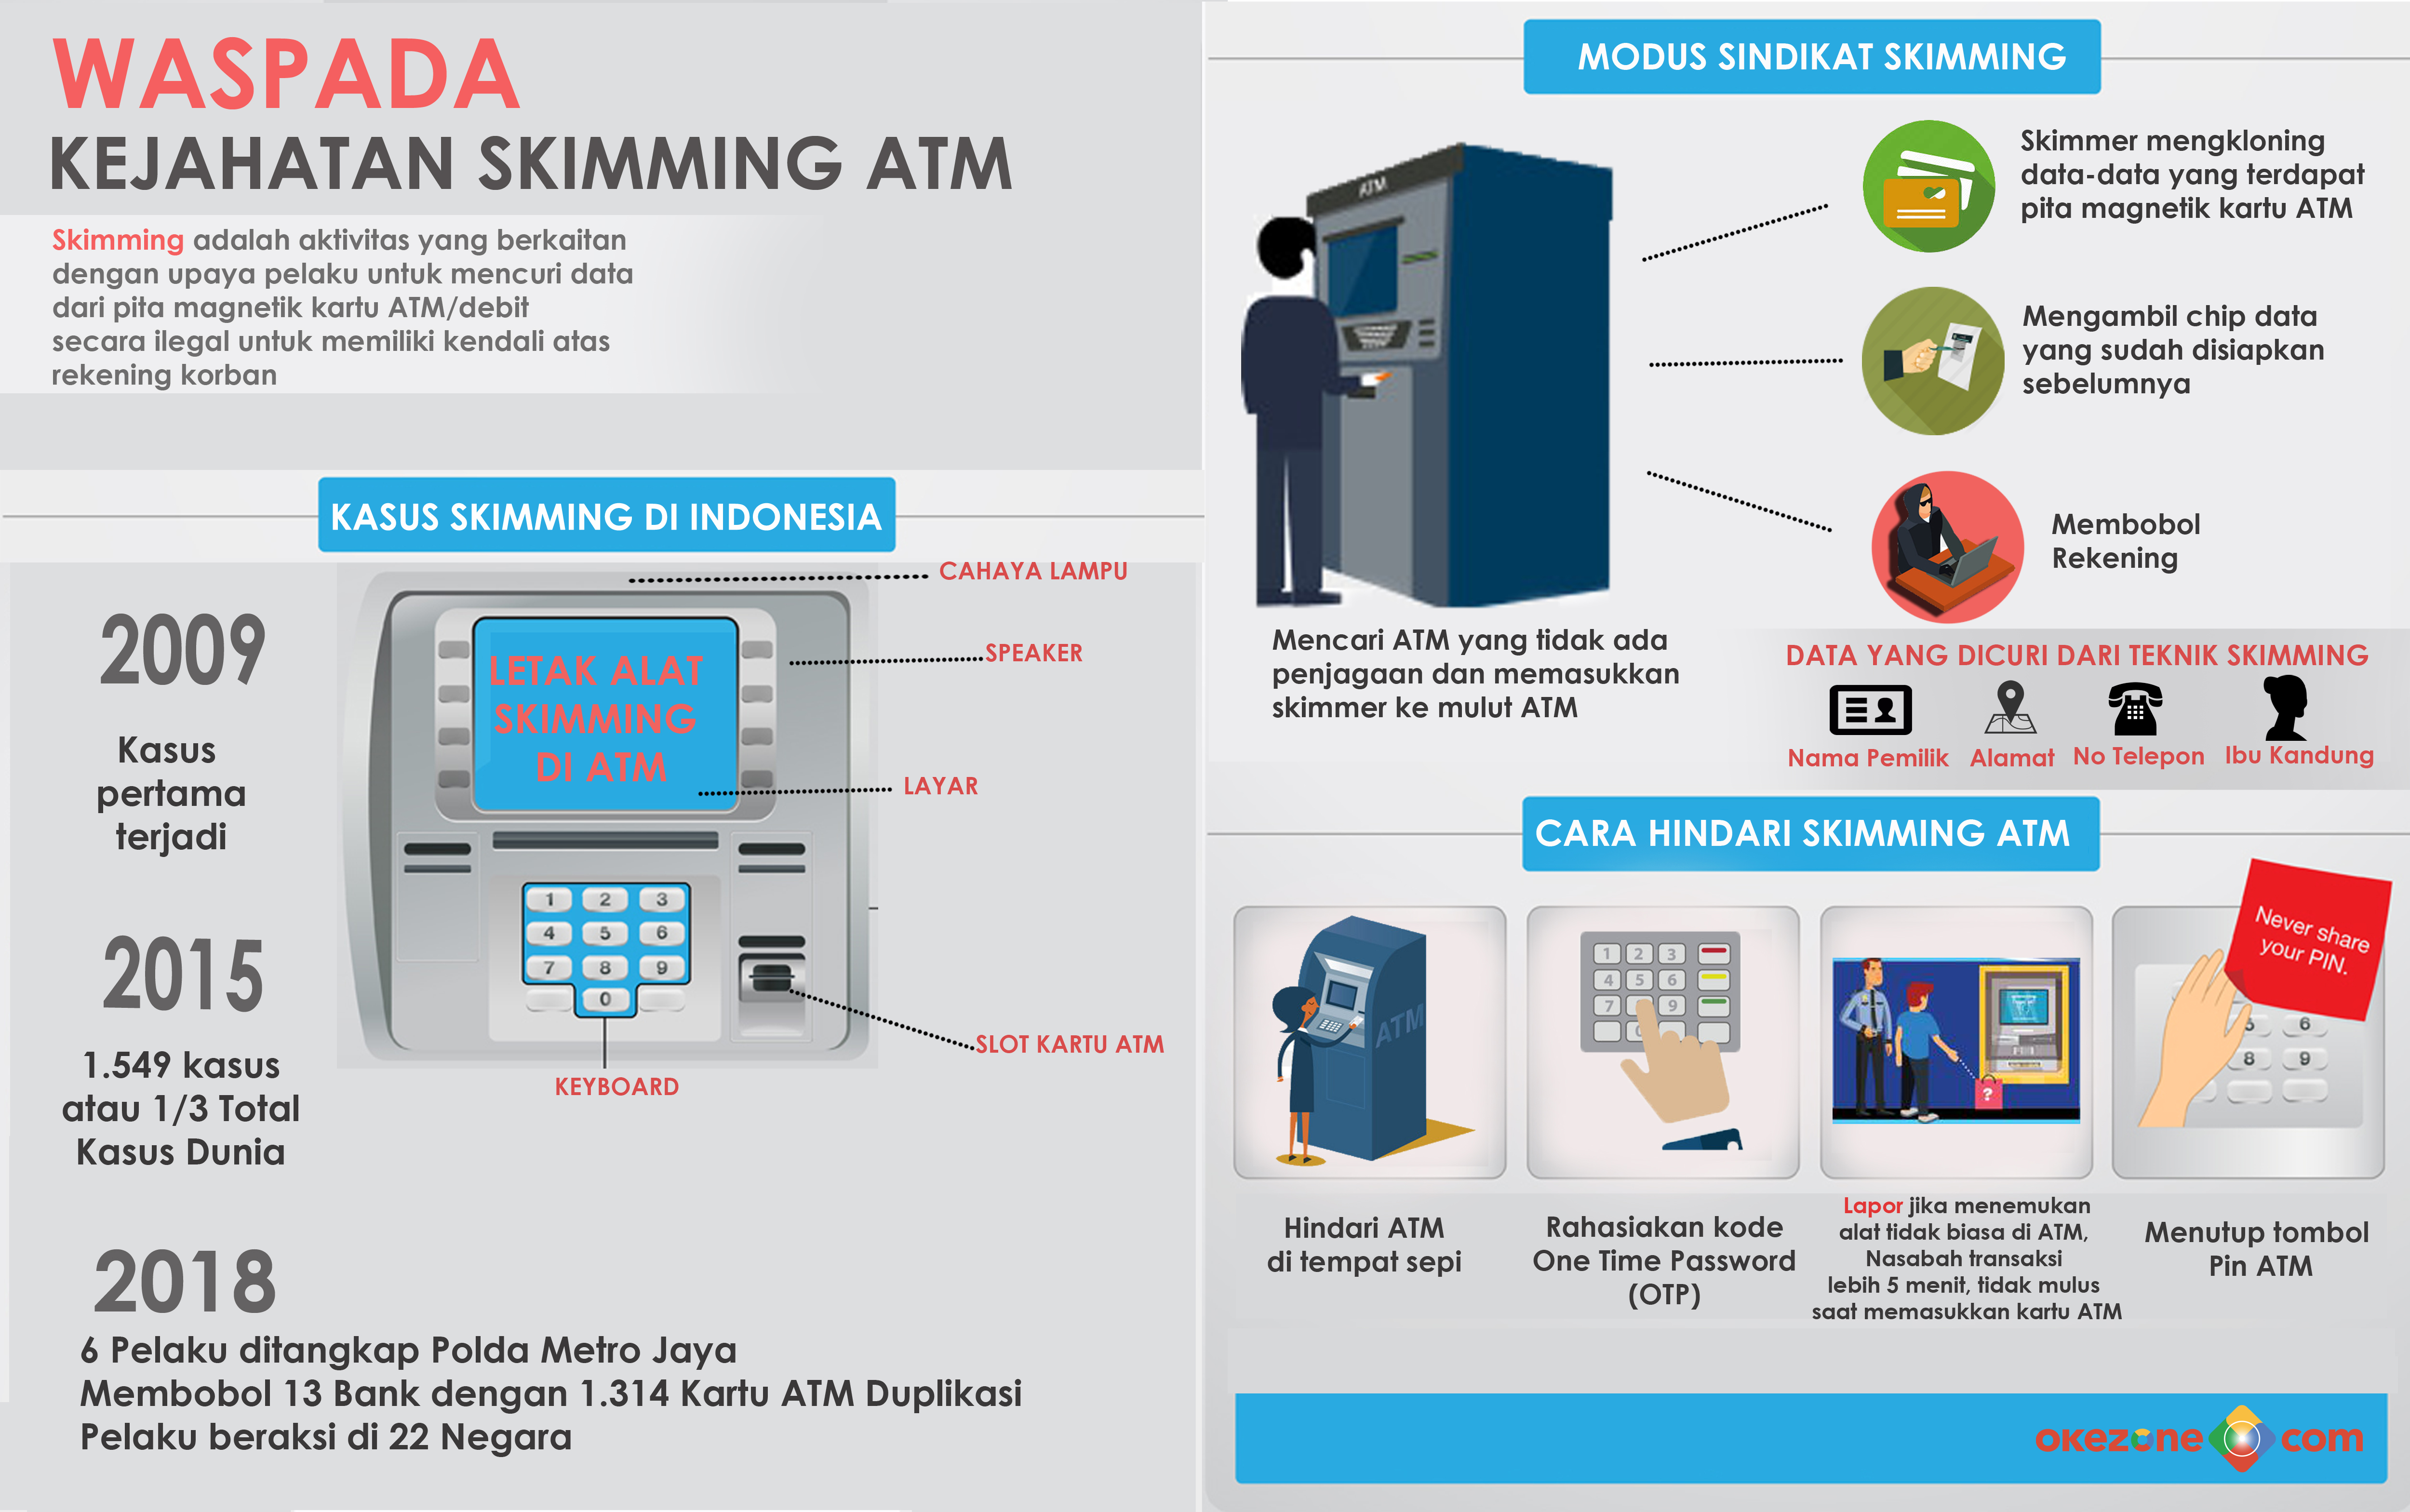 Waspada Kejahatan Skimming ATM -